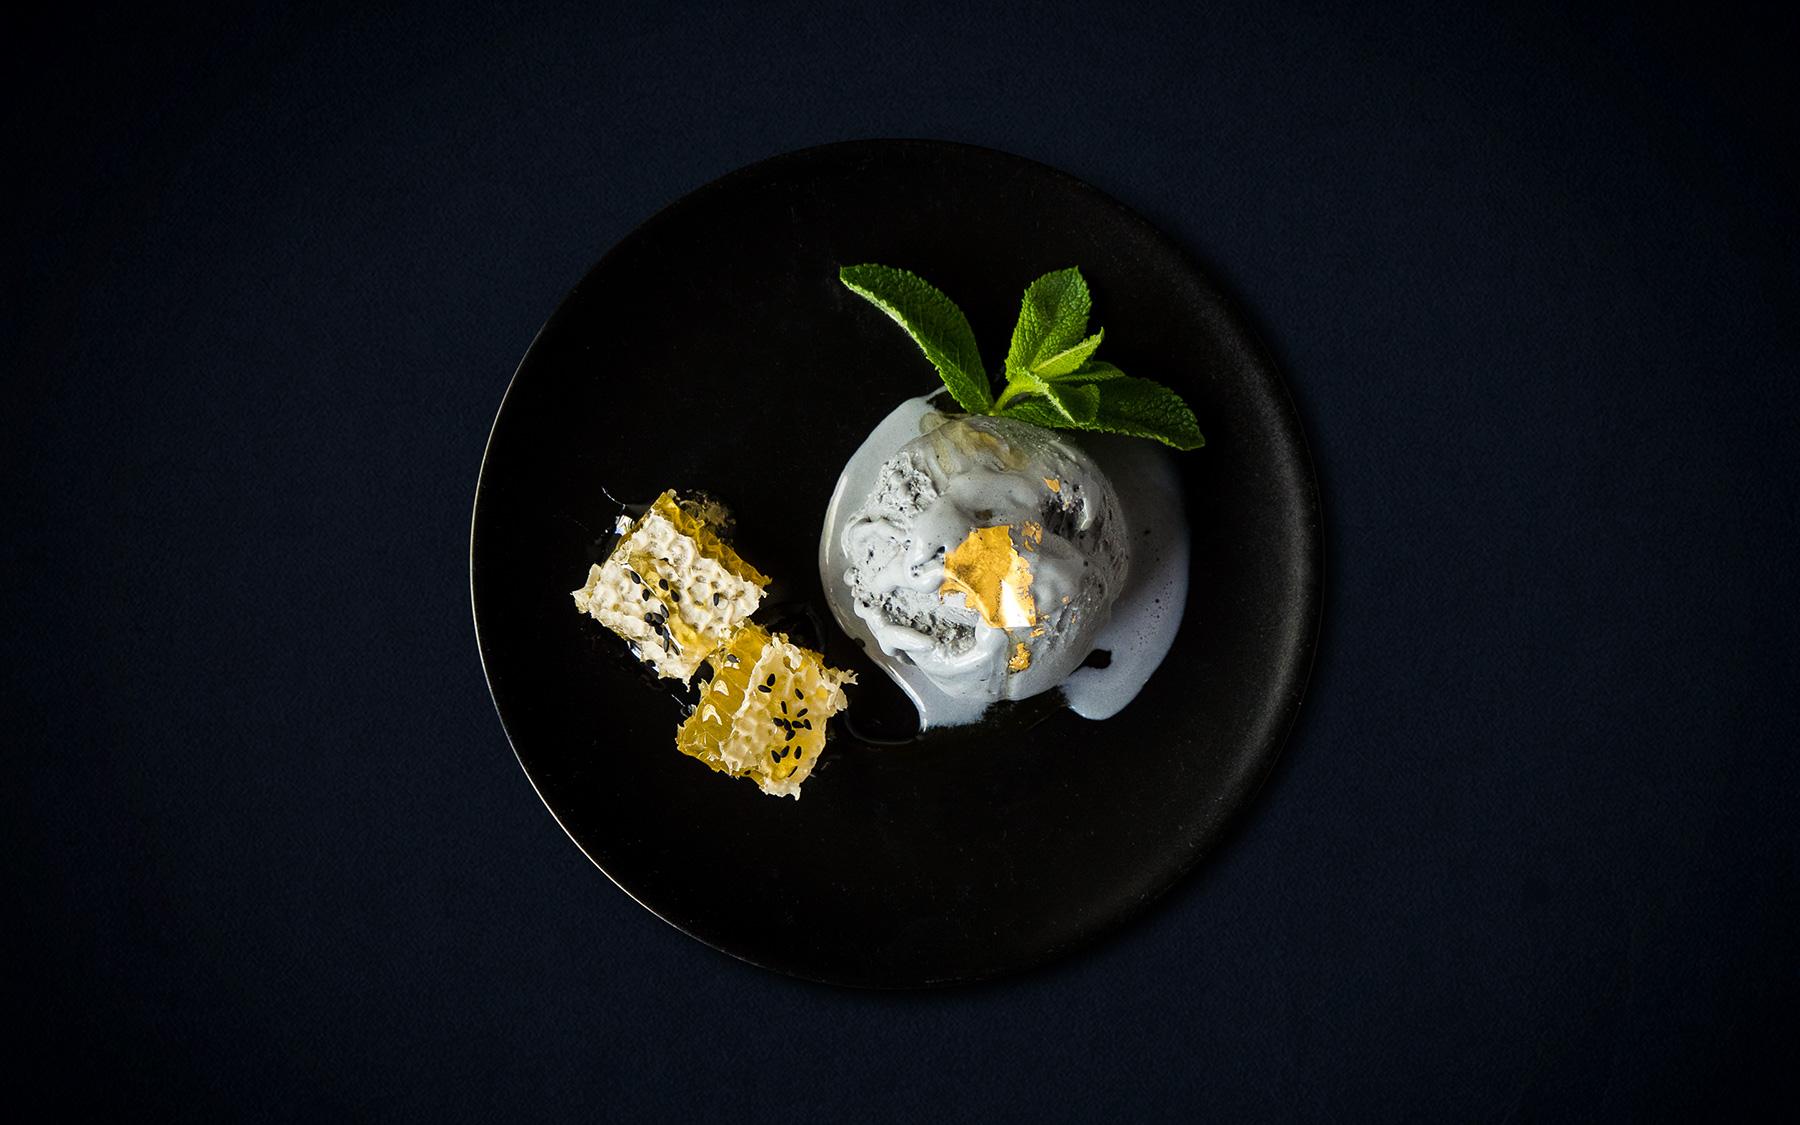 Saison Dessert